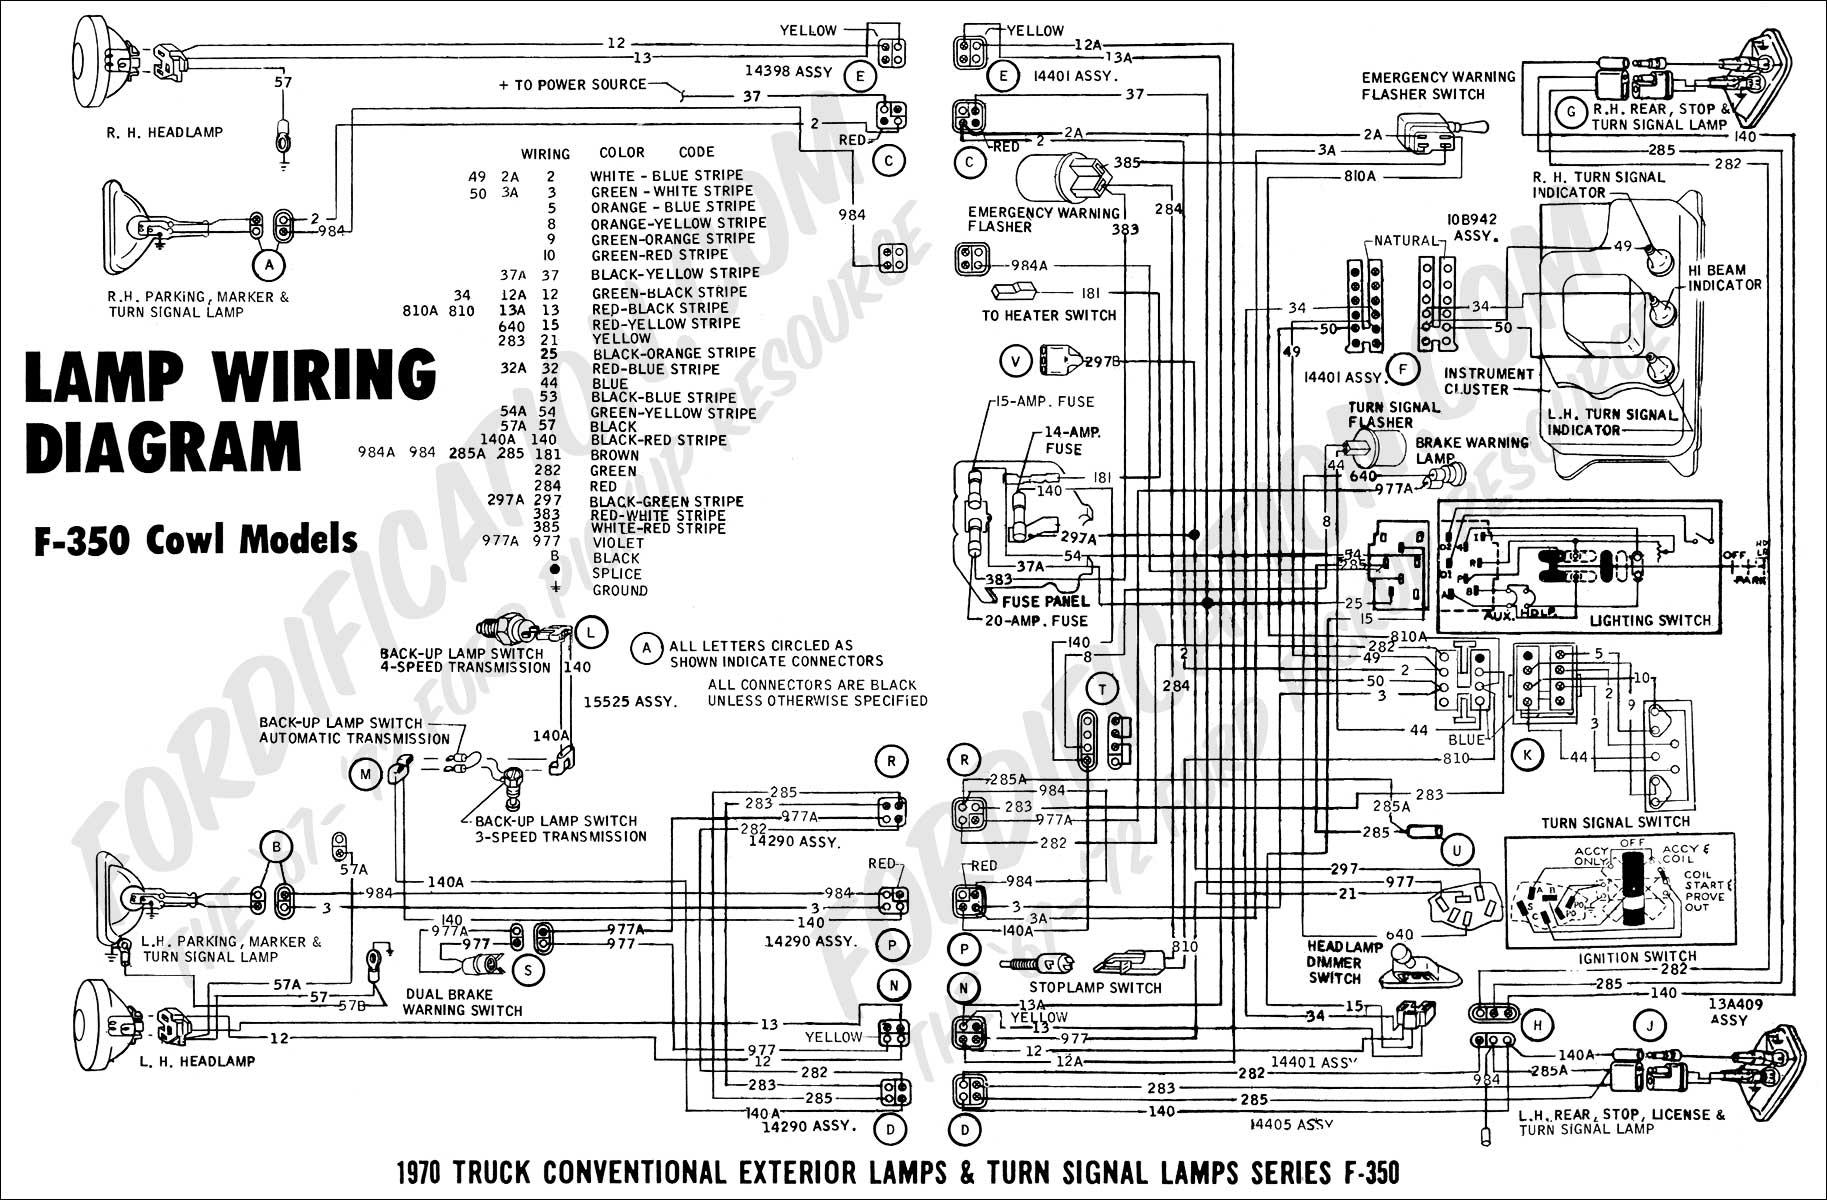 Colorful Hf21kj005 Actuator Motor Wiring Schematic Model - Wiring ...